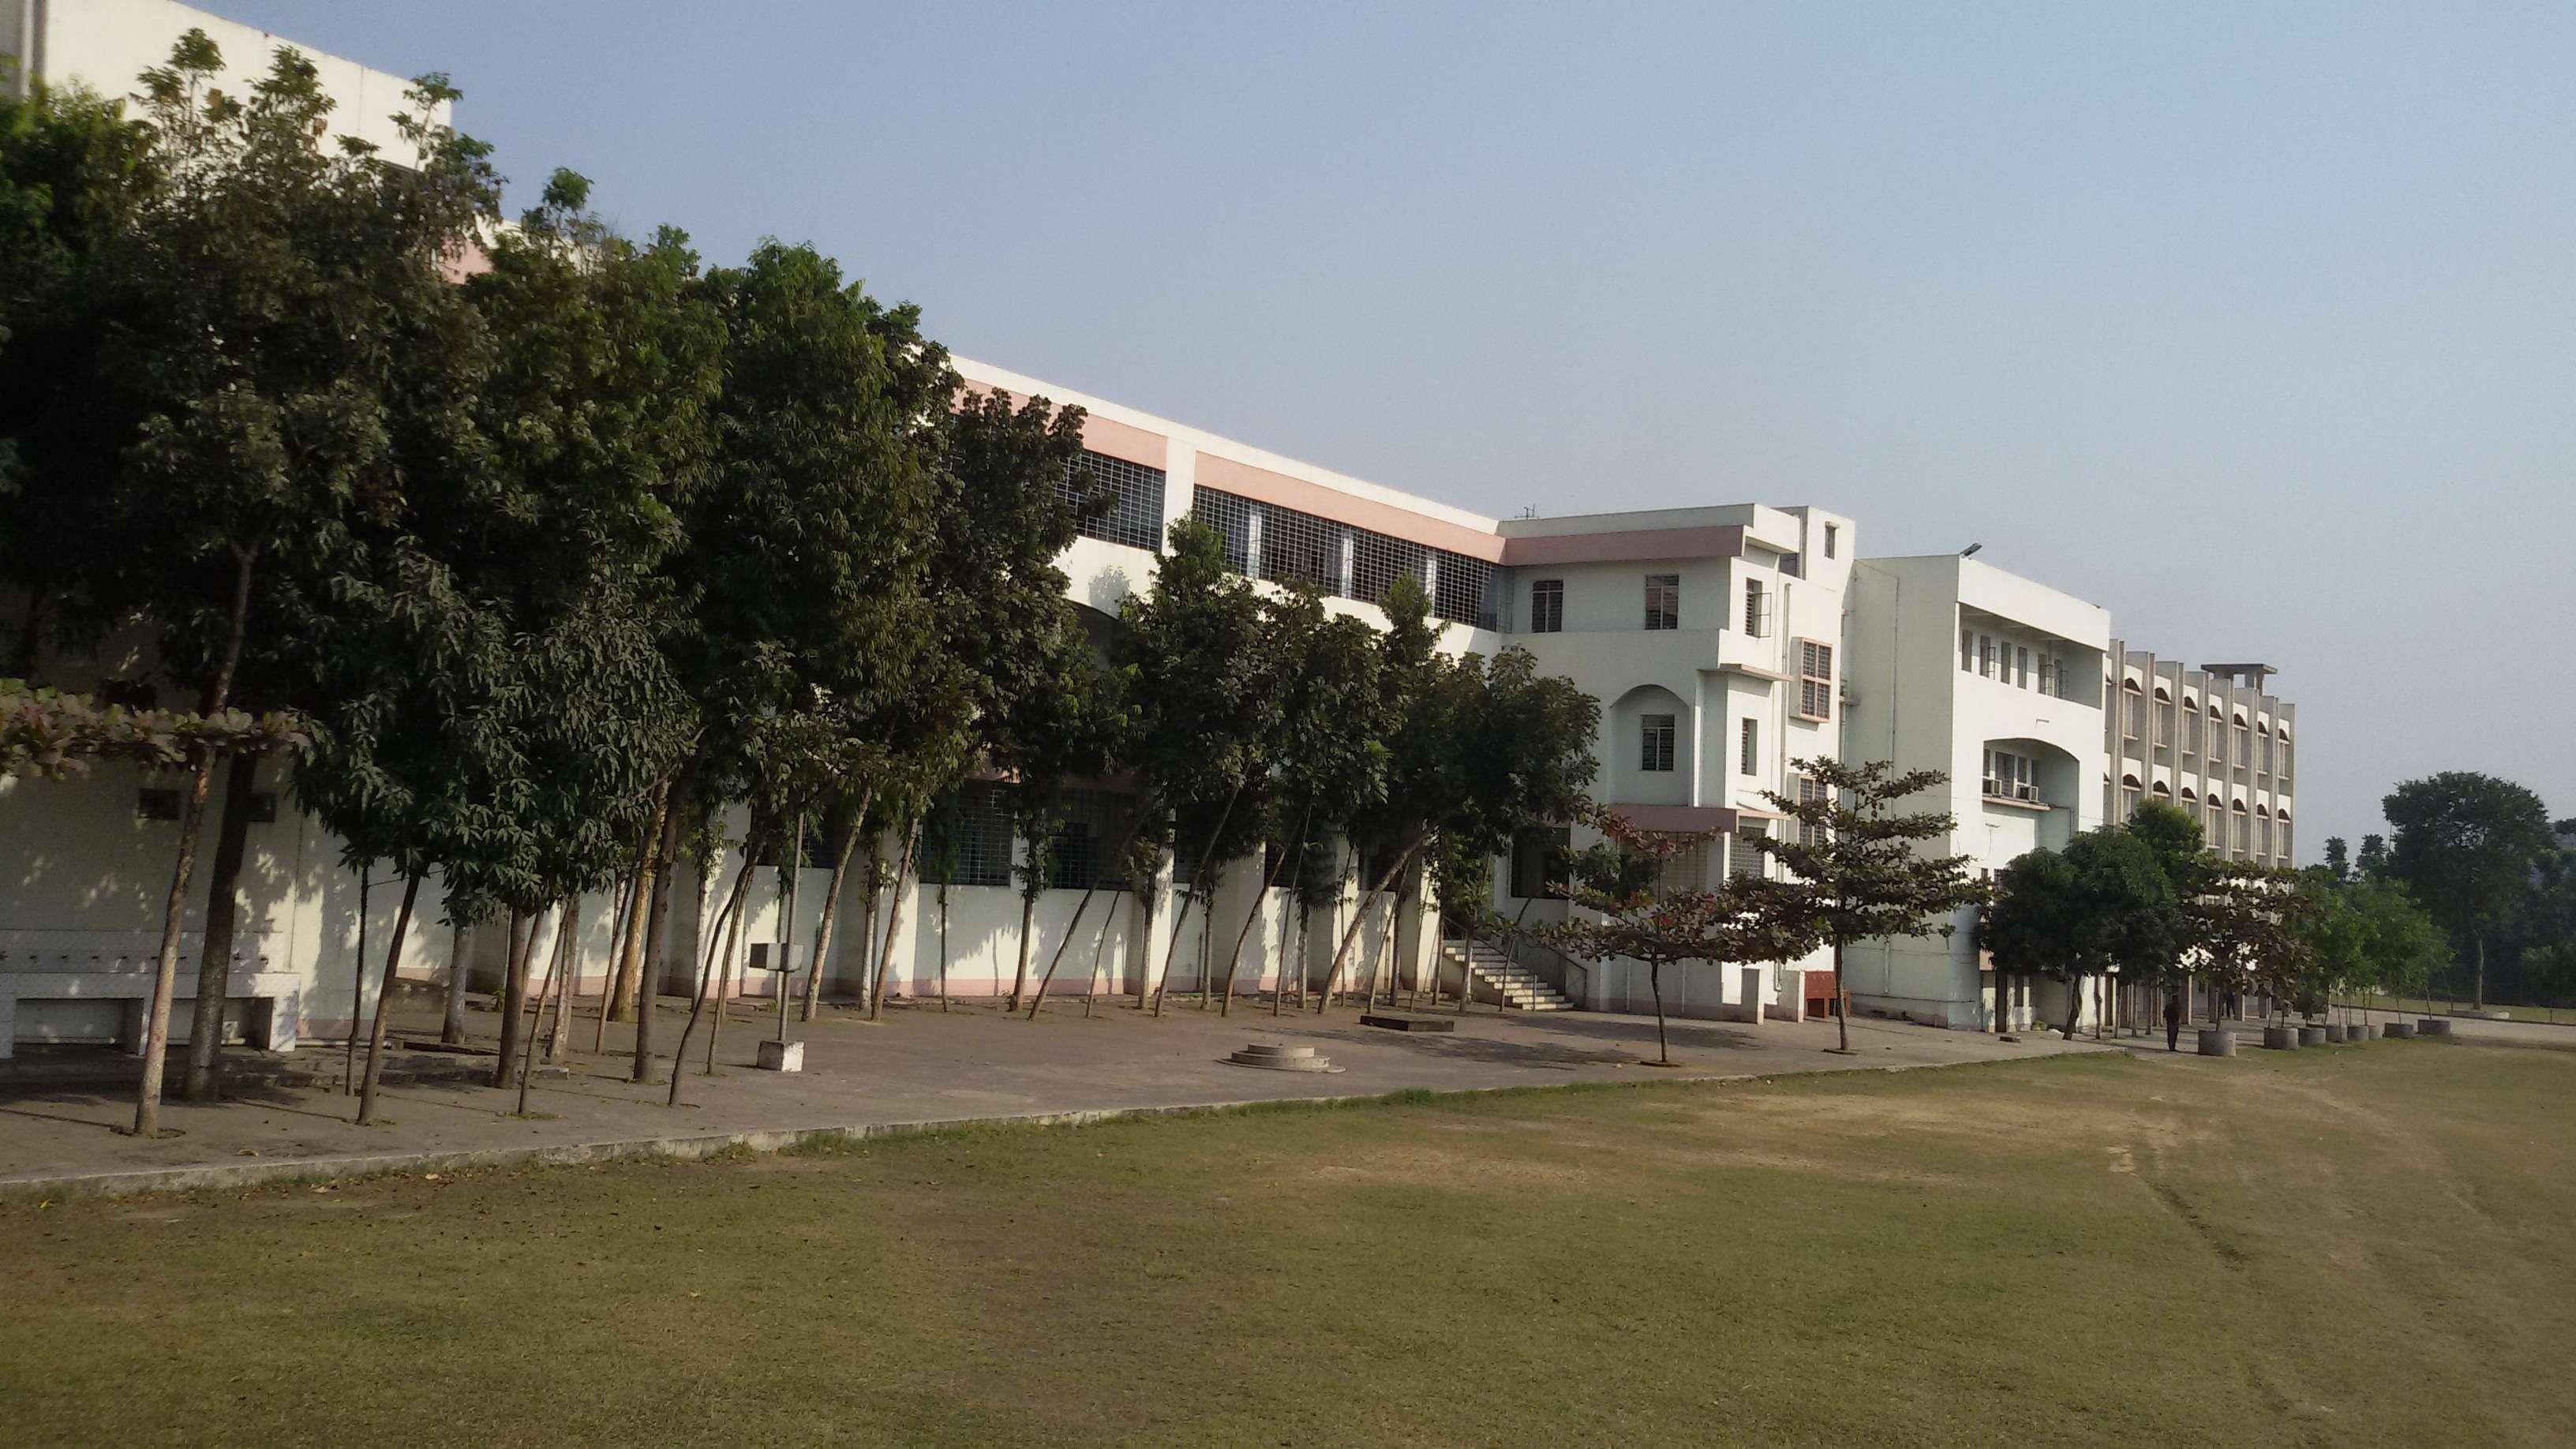 S K S PUBLIC SCHOOL RONAI ROAD MANGAL PUR RANIGANJ WEST BENGAL 2430085